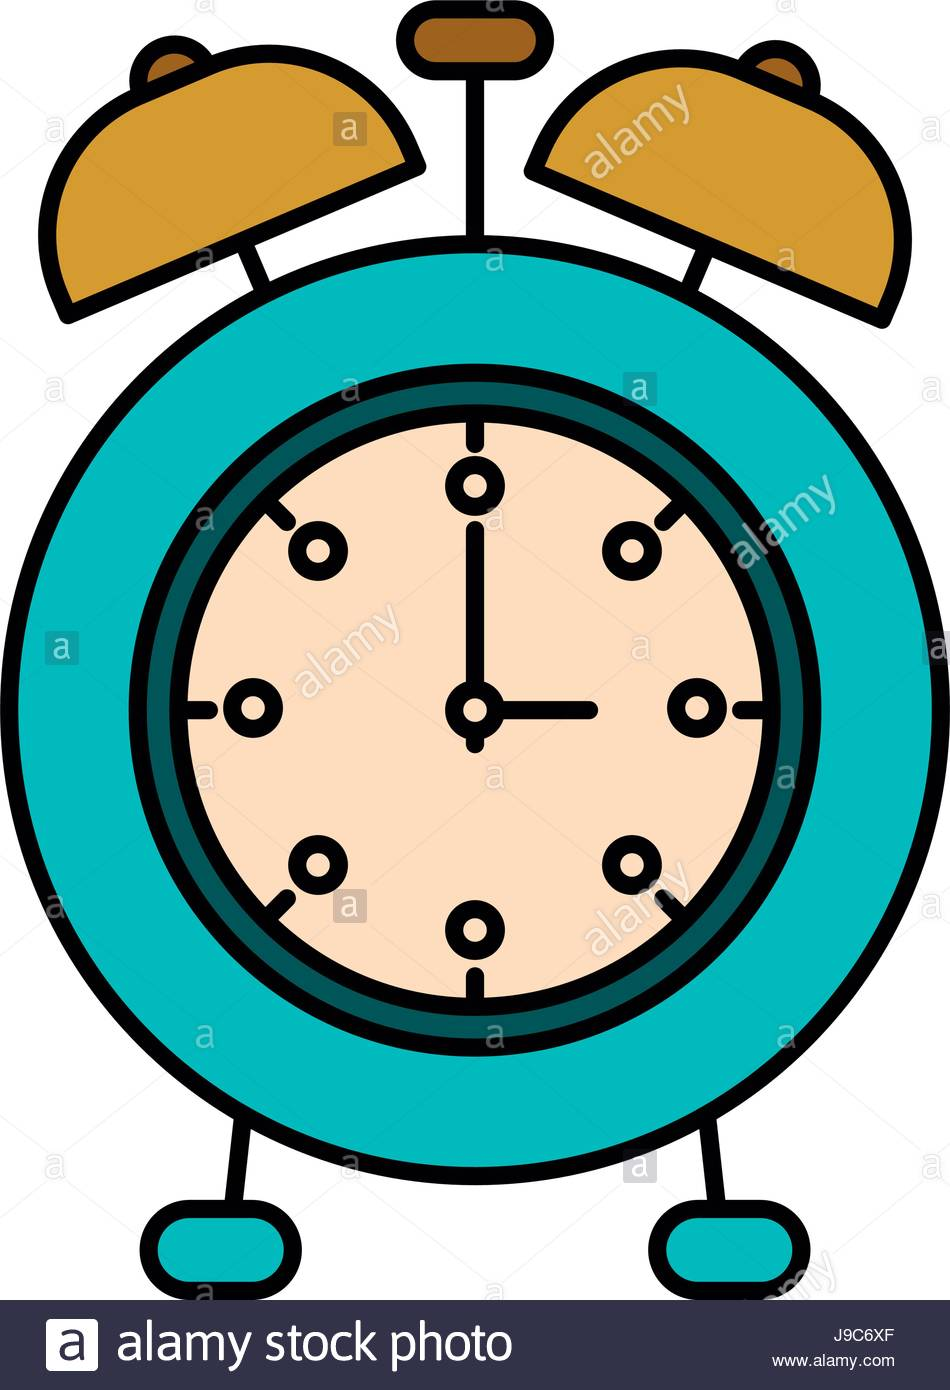 950x1390 Colorful Silhouette Image Alarm Clock Stock Vector Art